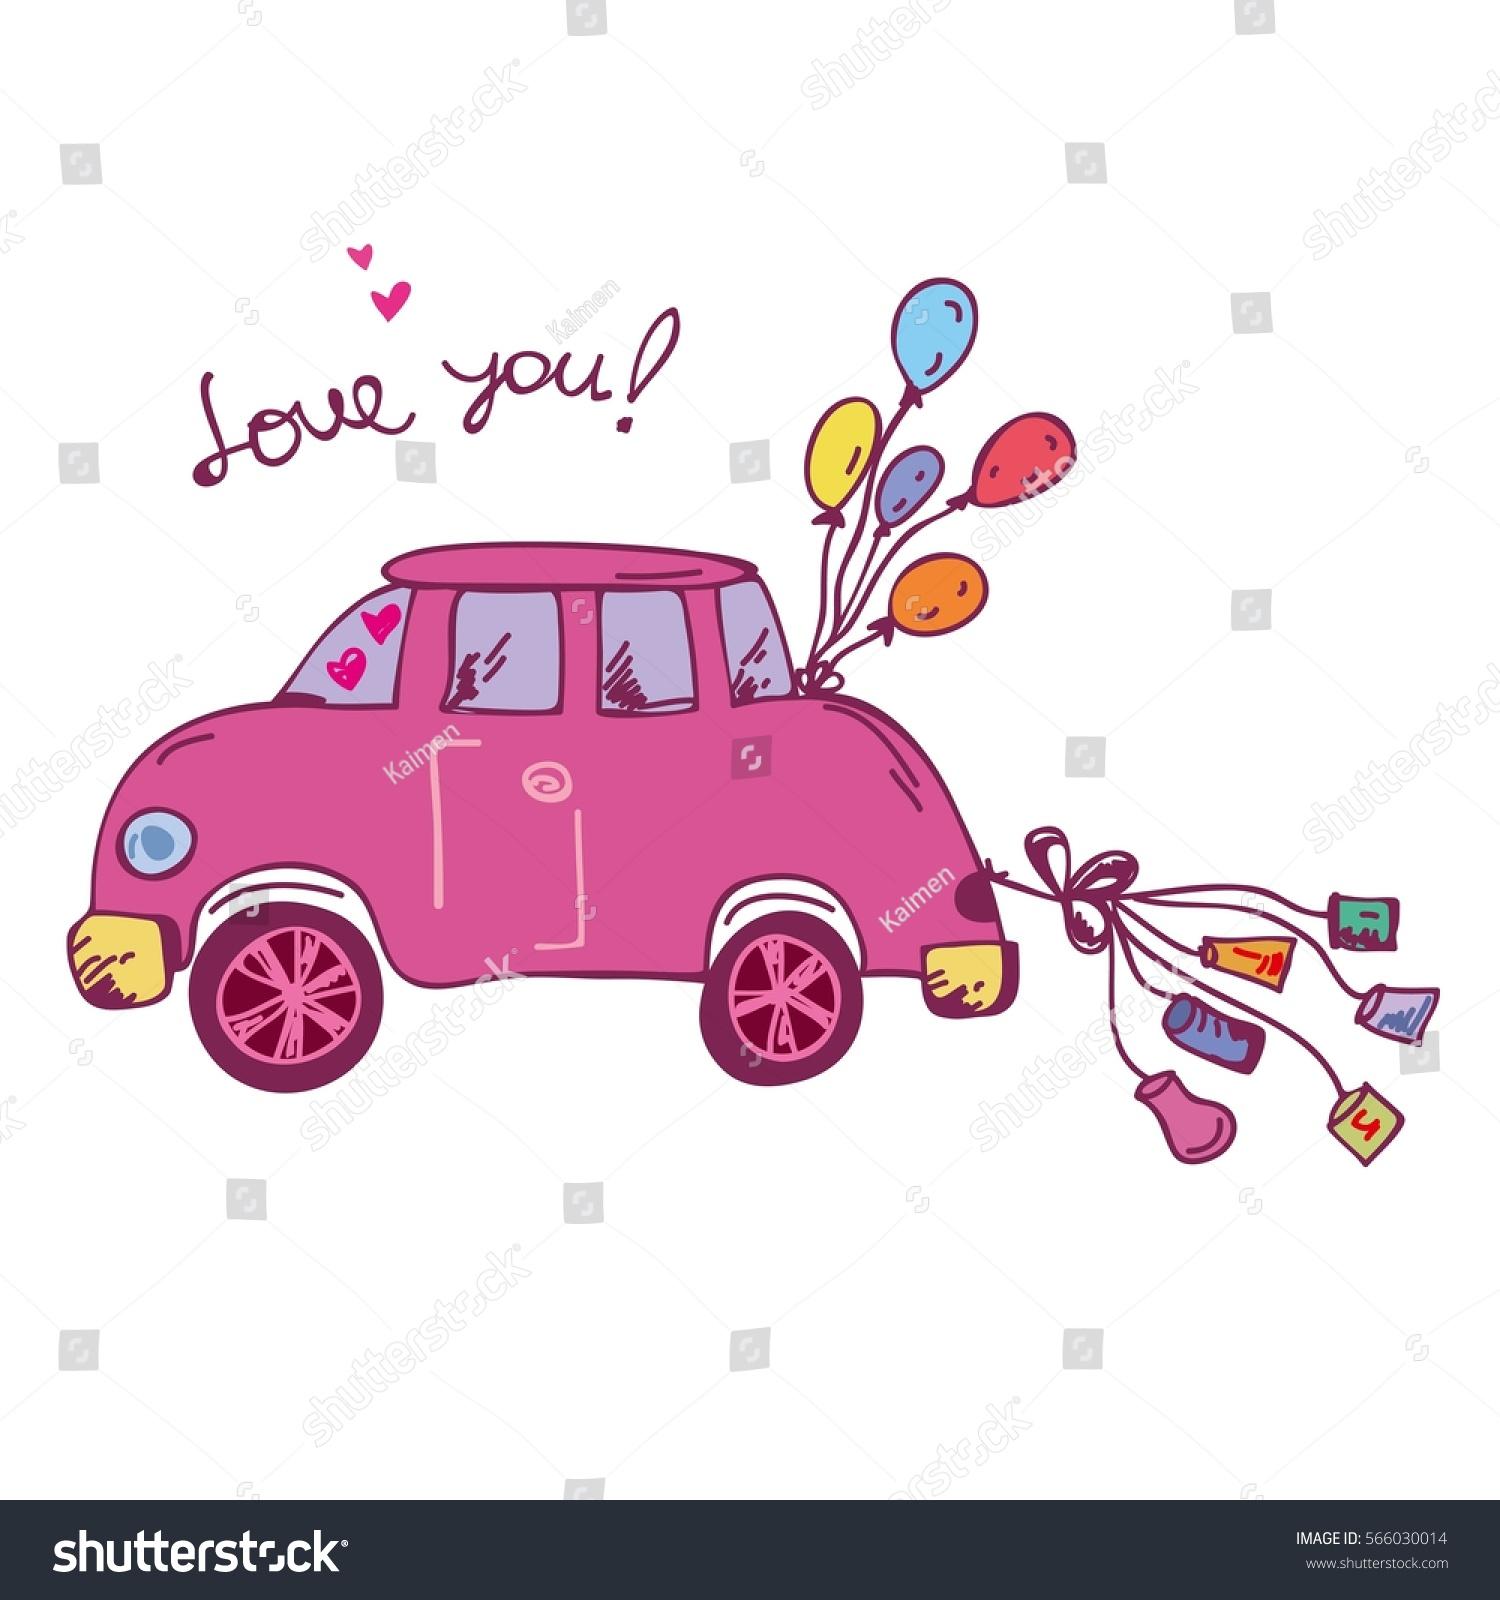 Hand Drawn Pink Wedding Car Vector Stock Vector (Royalty Free ...